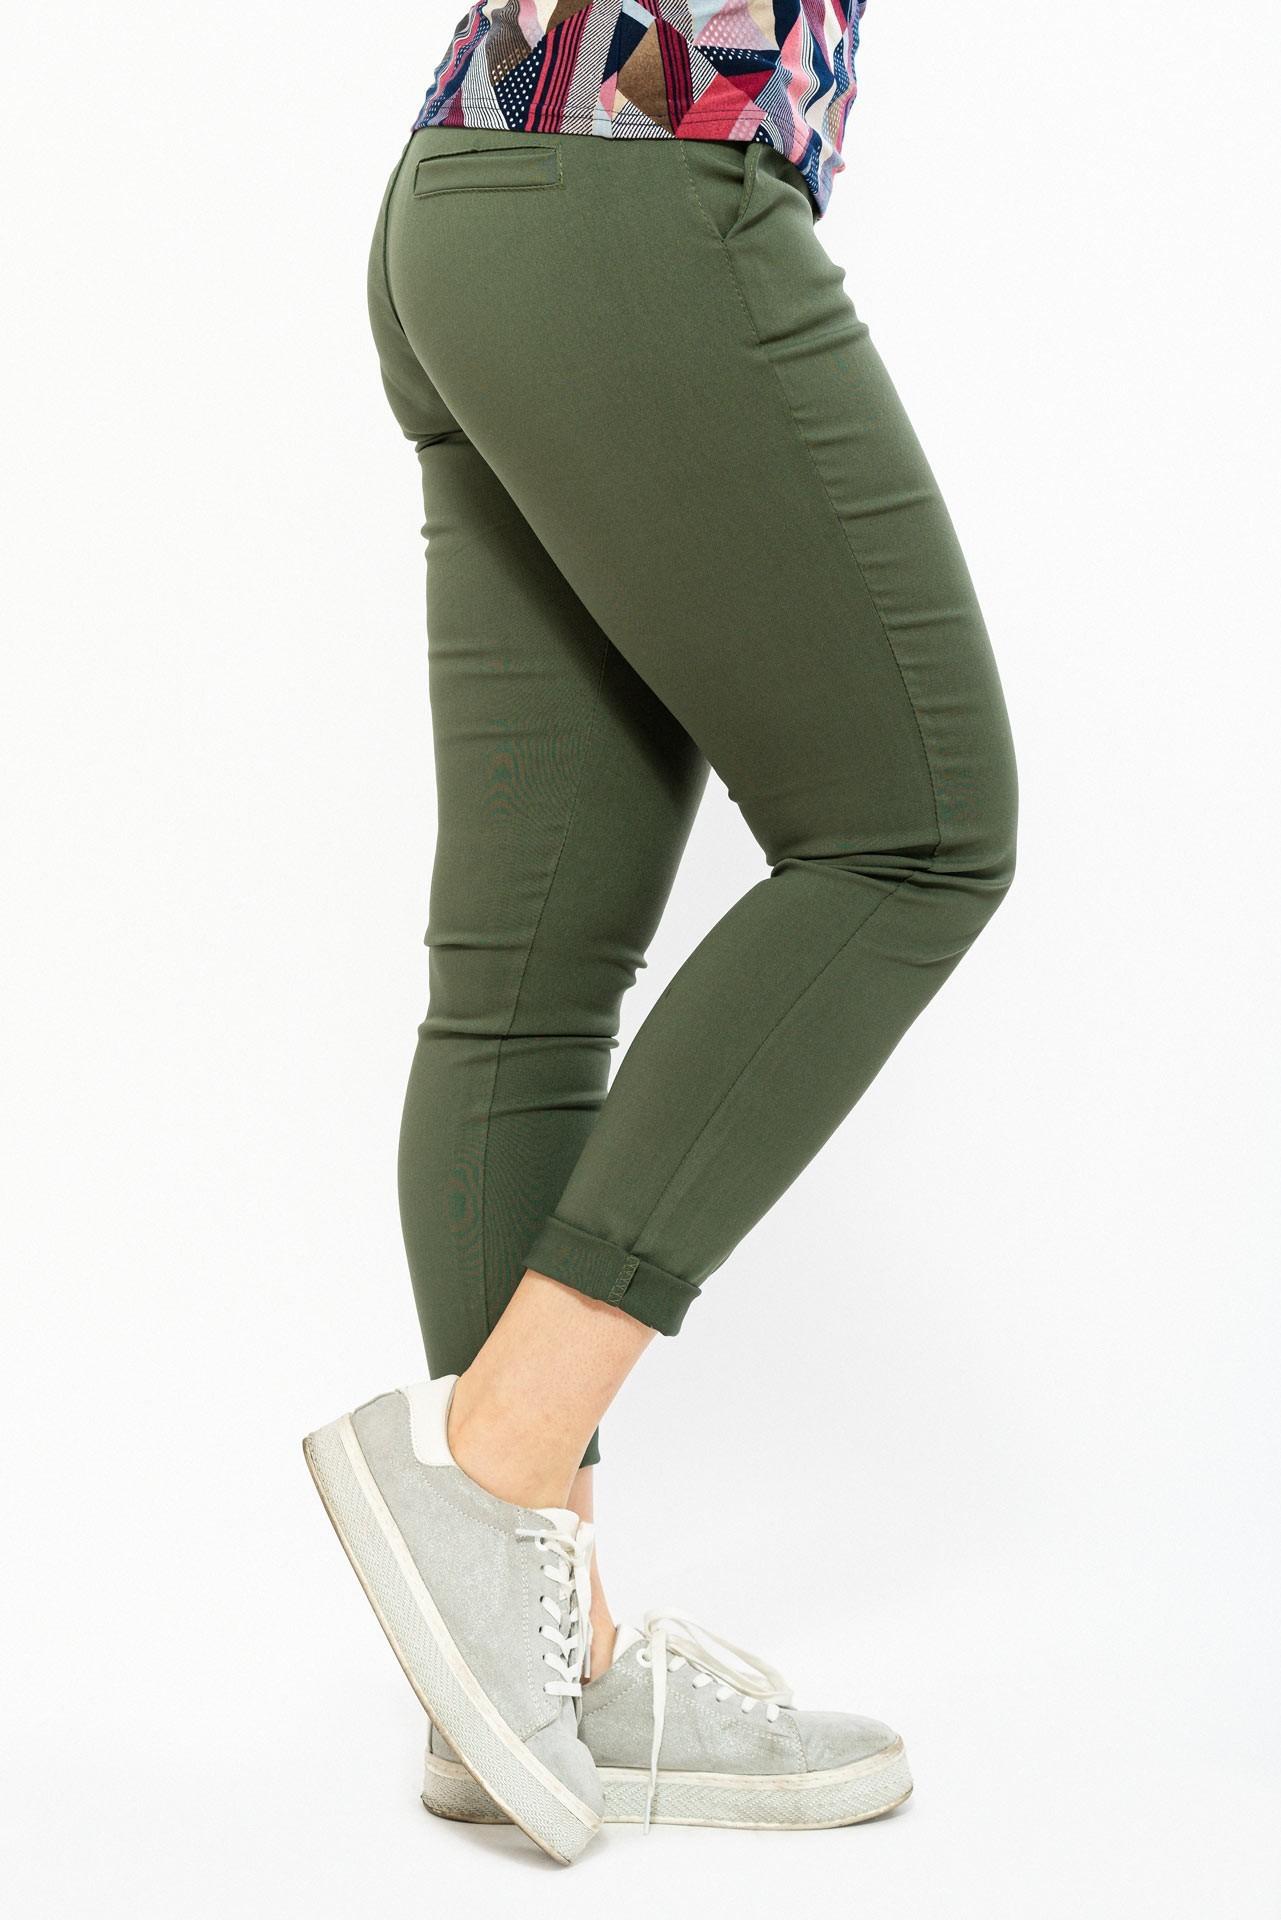 Dámské kalhoty NINA II